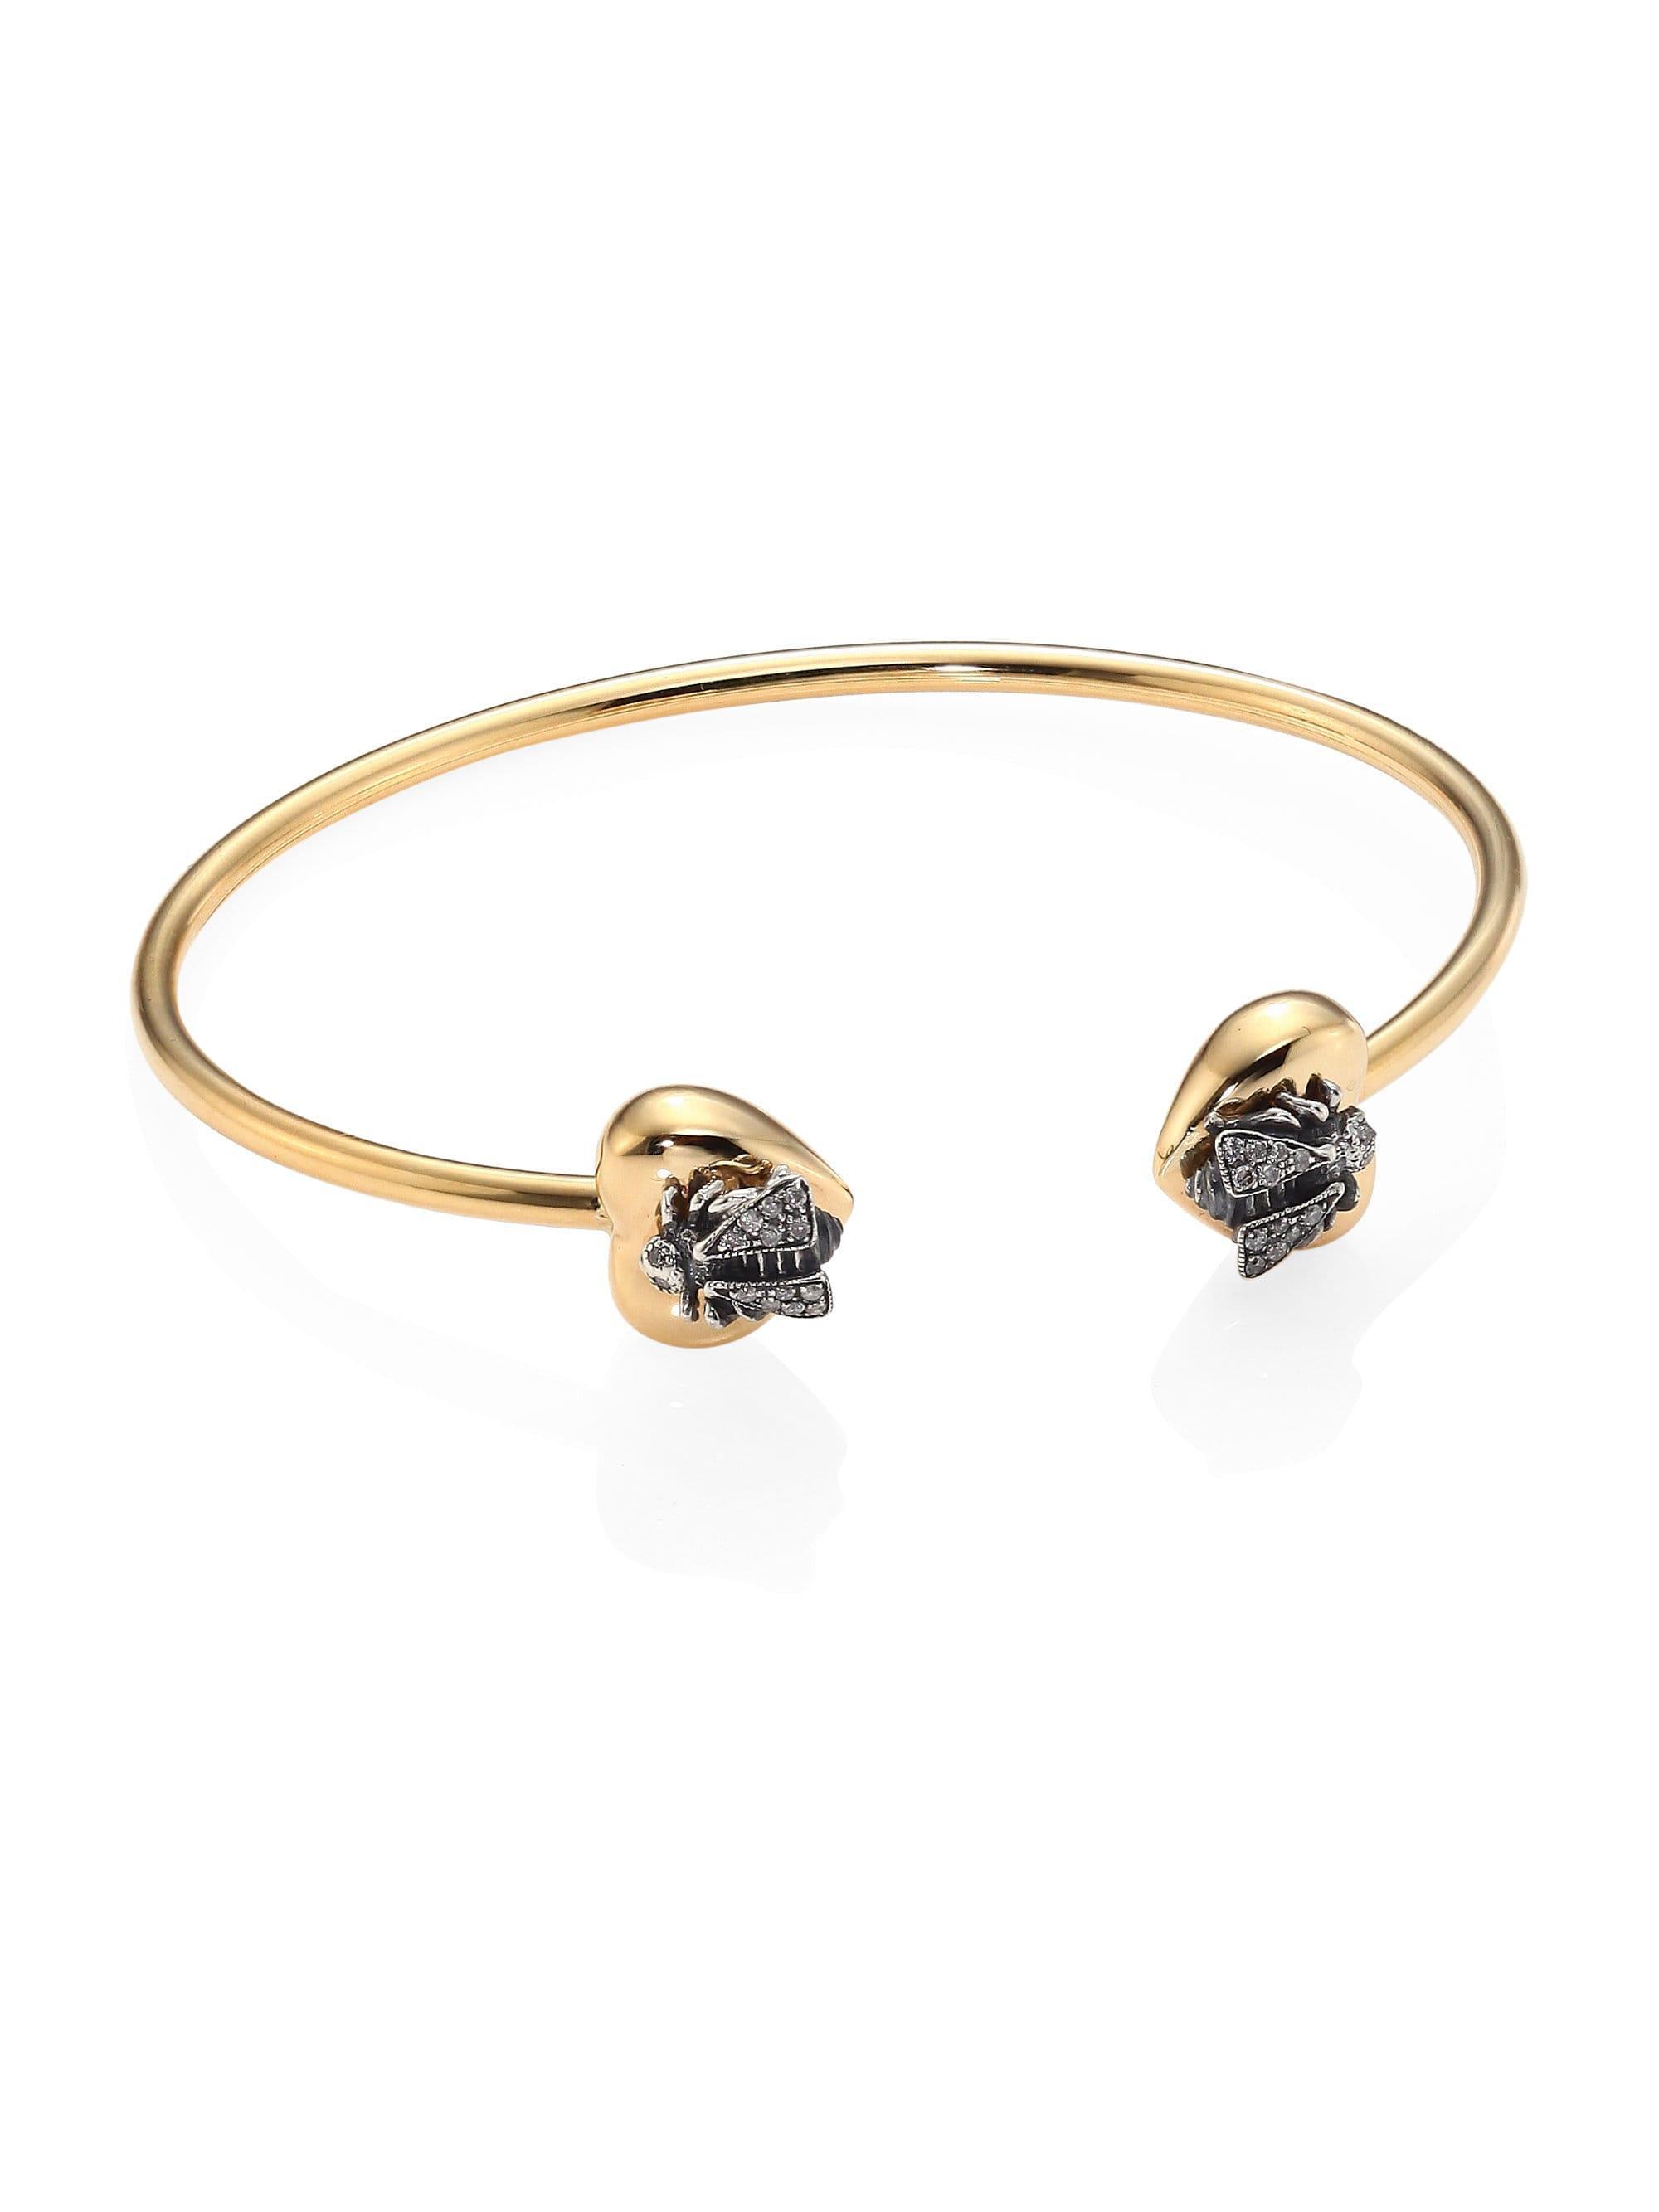 6fd8a7e9350 Gucci. Women s Metallic Le Marché Des Merveilles Grey Diamond   18k Yellow  Gold Bangle Bracelet